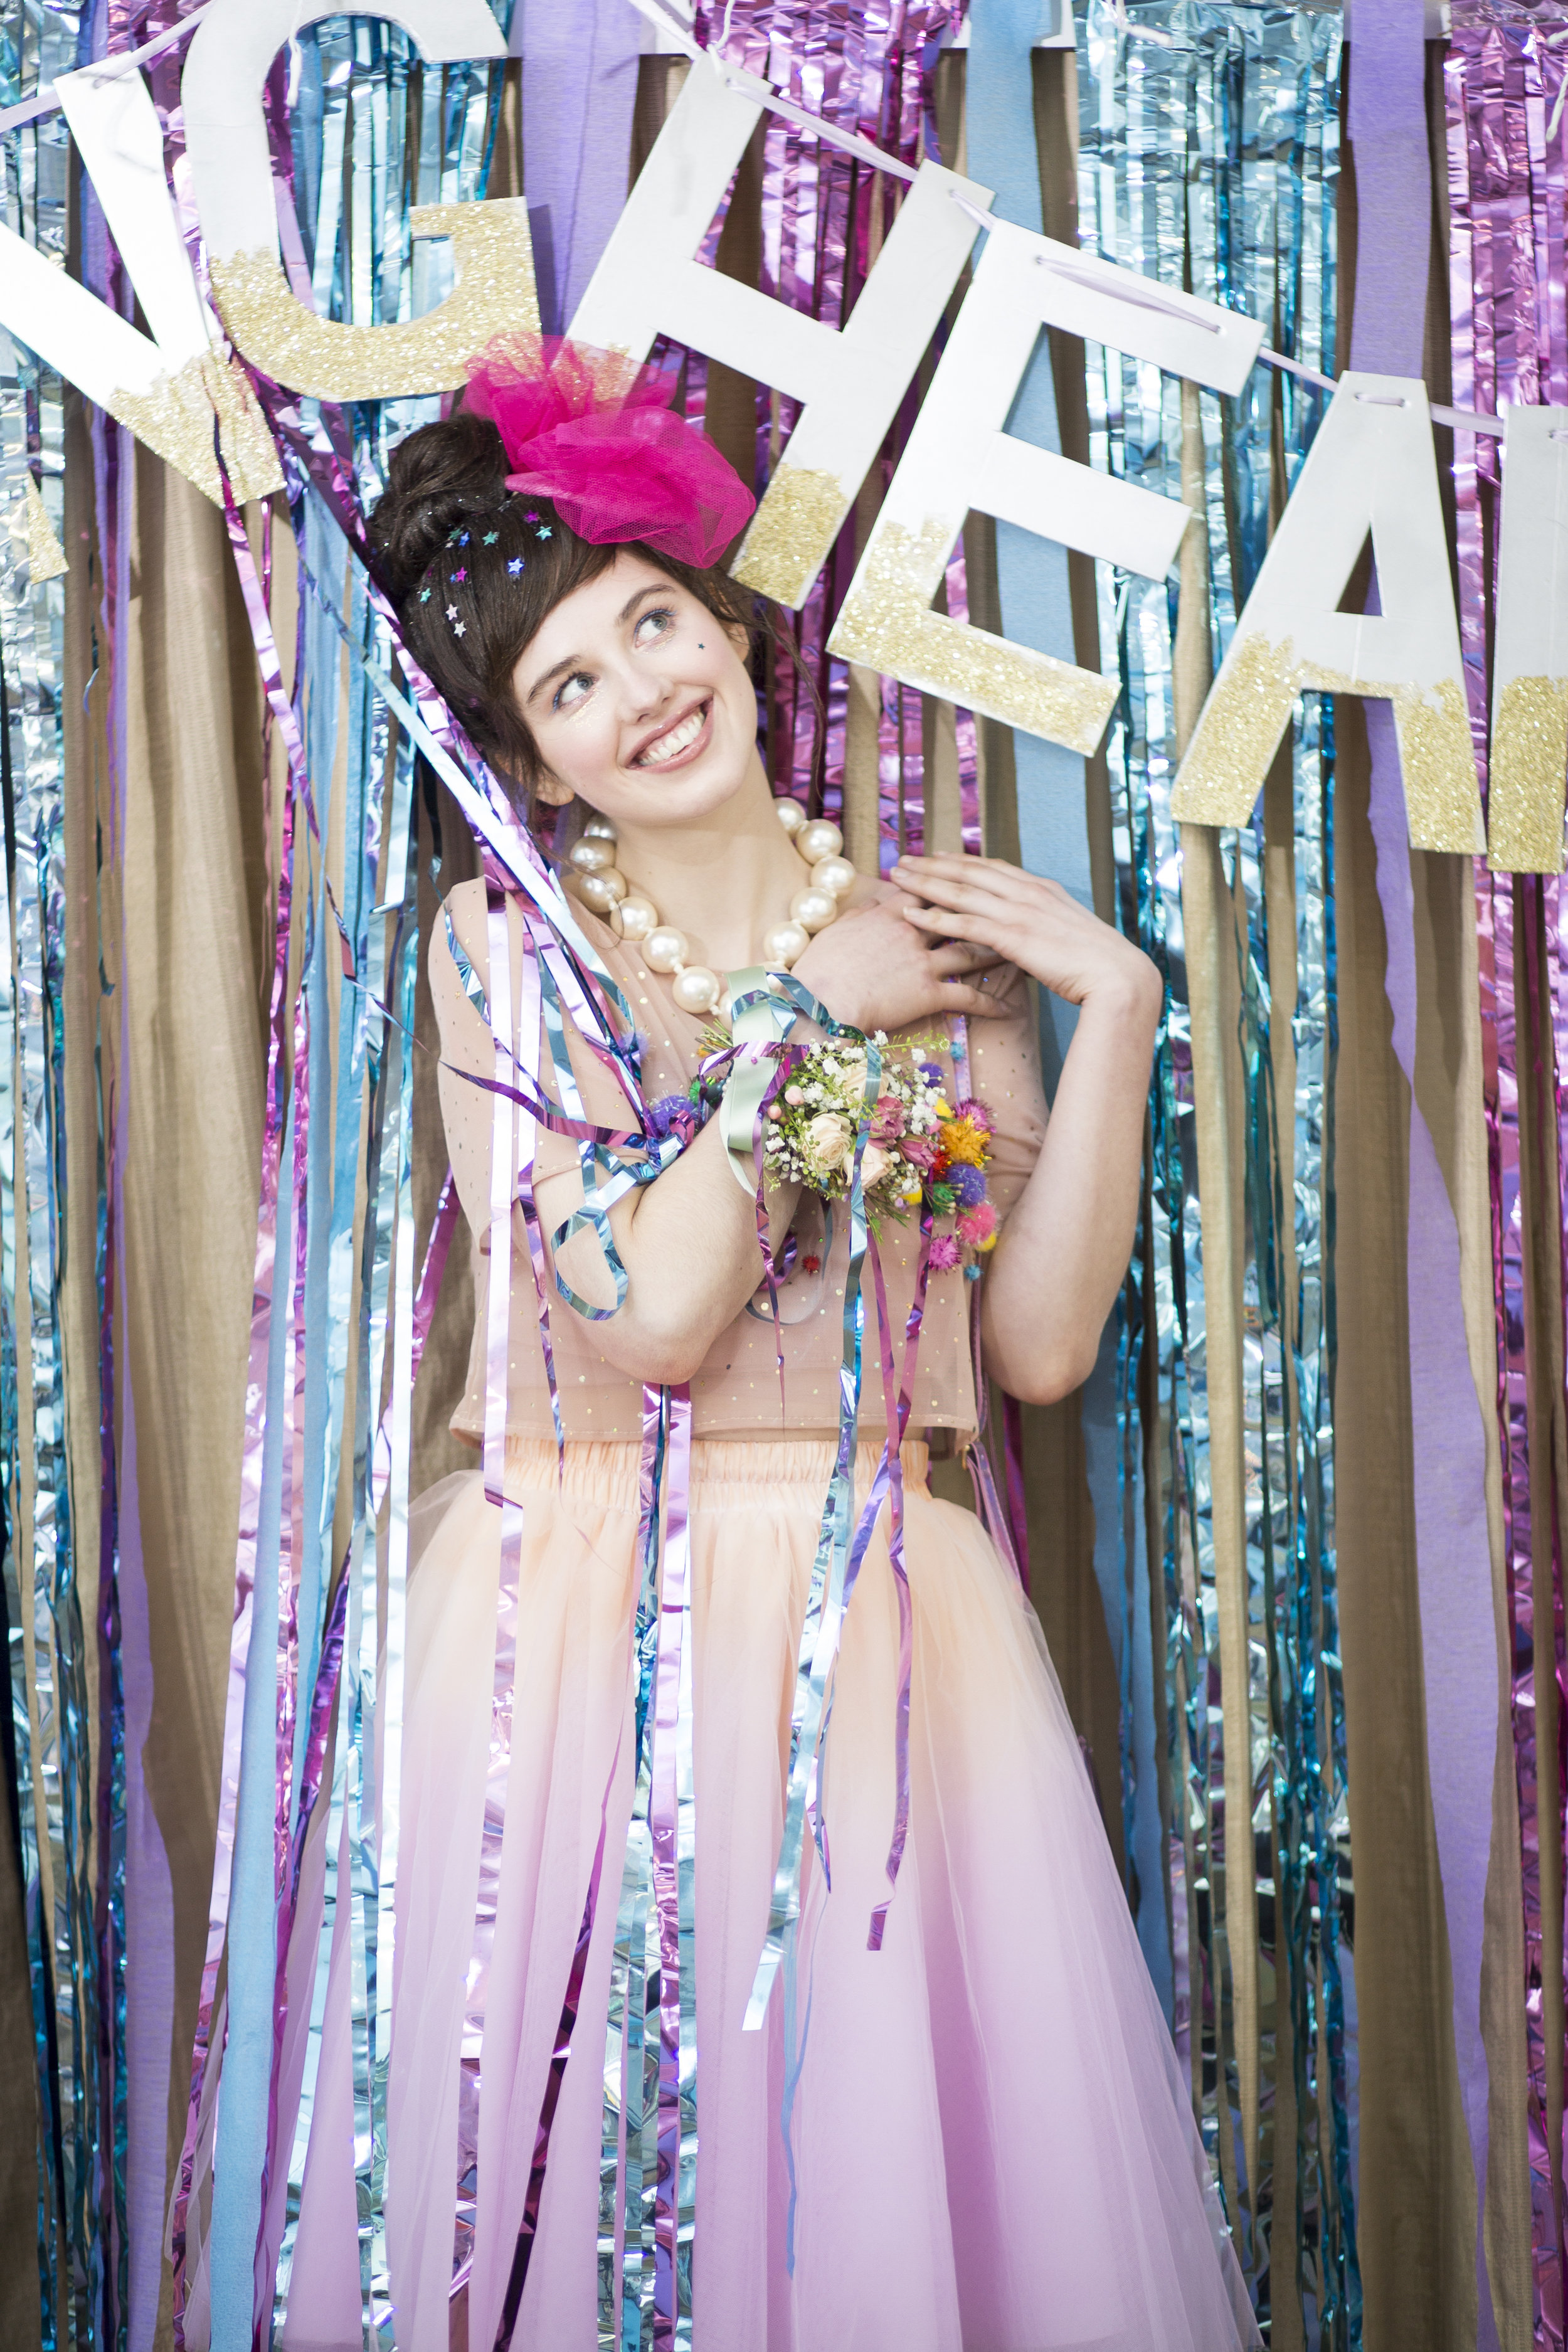 Prom Night Wedding Shoot Meadham Kirchhoff Carrie 00099.jpg